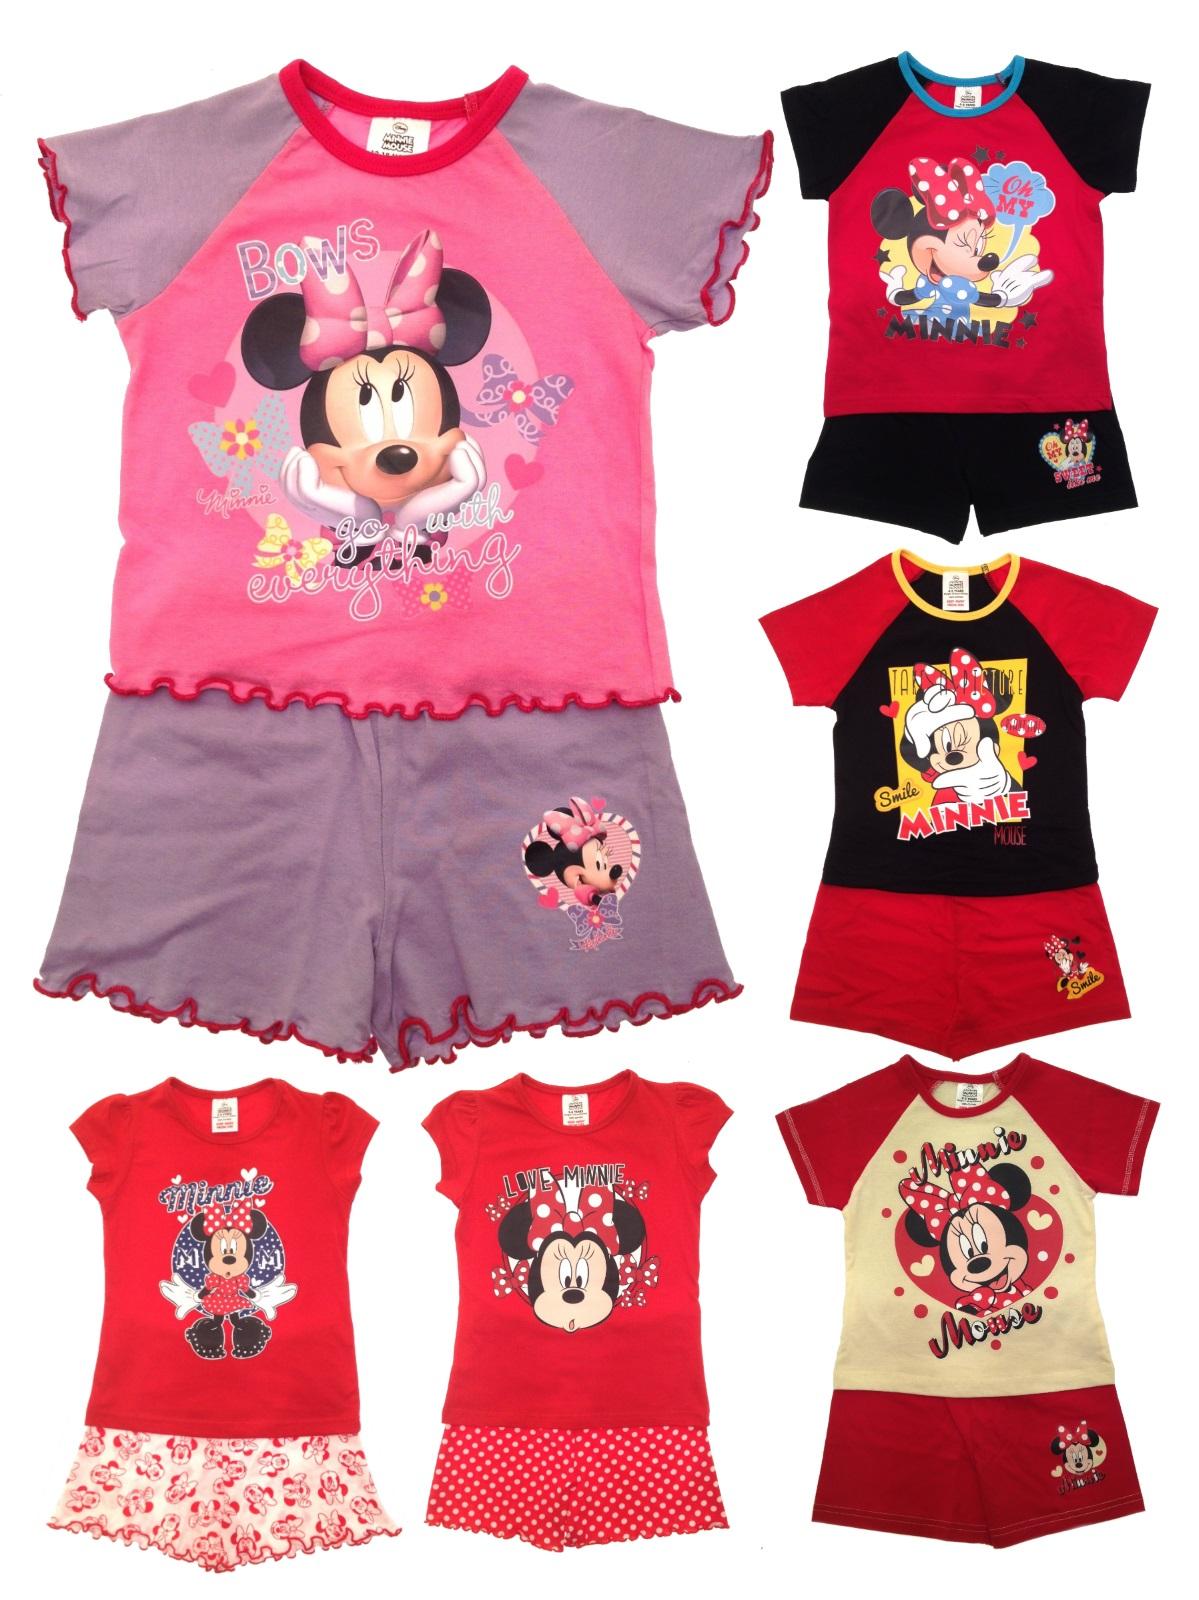 6d4cab33724f Kids Girls Official Disney Minnie Mouse Short Pyjamas Pj s Set Size ...